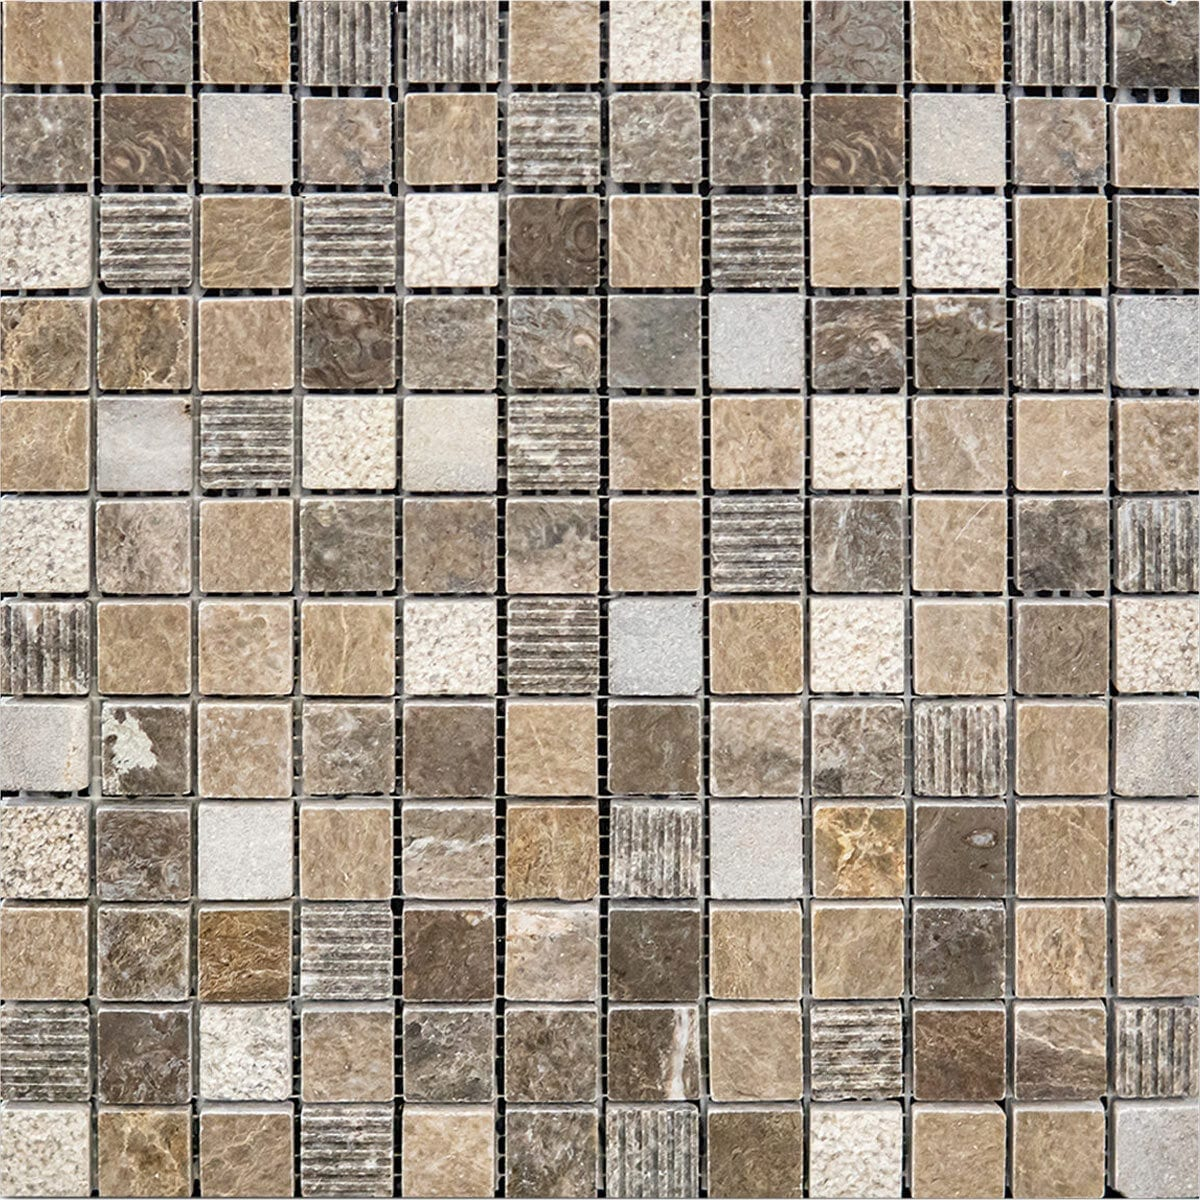 M50696 DT dillerstone mix grey brown 1